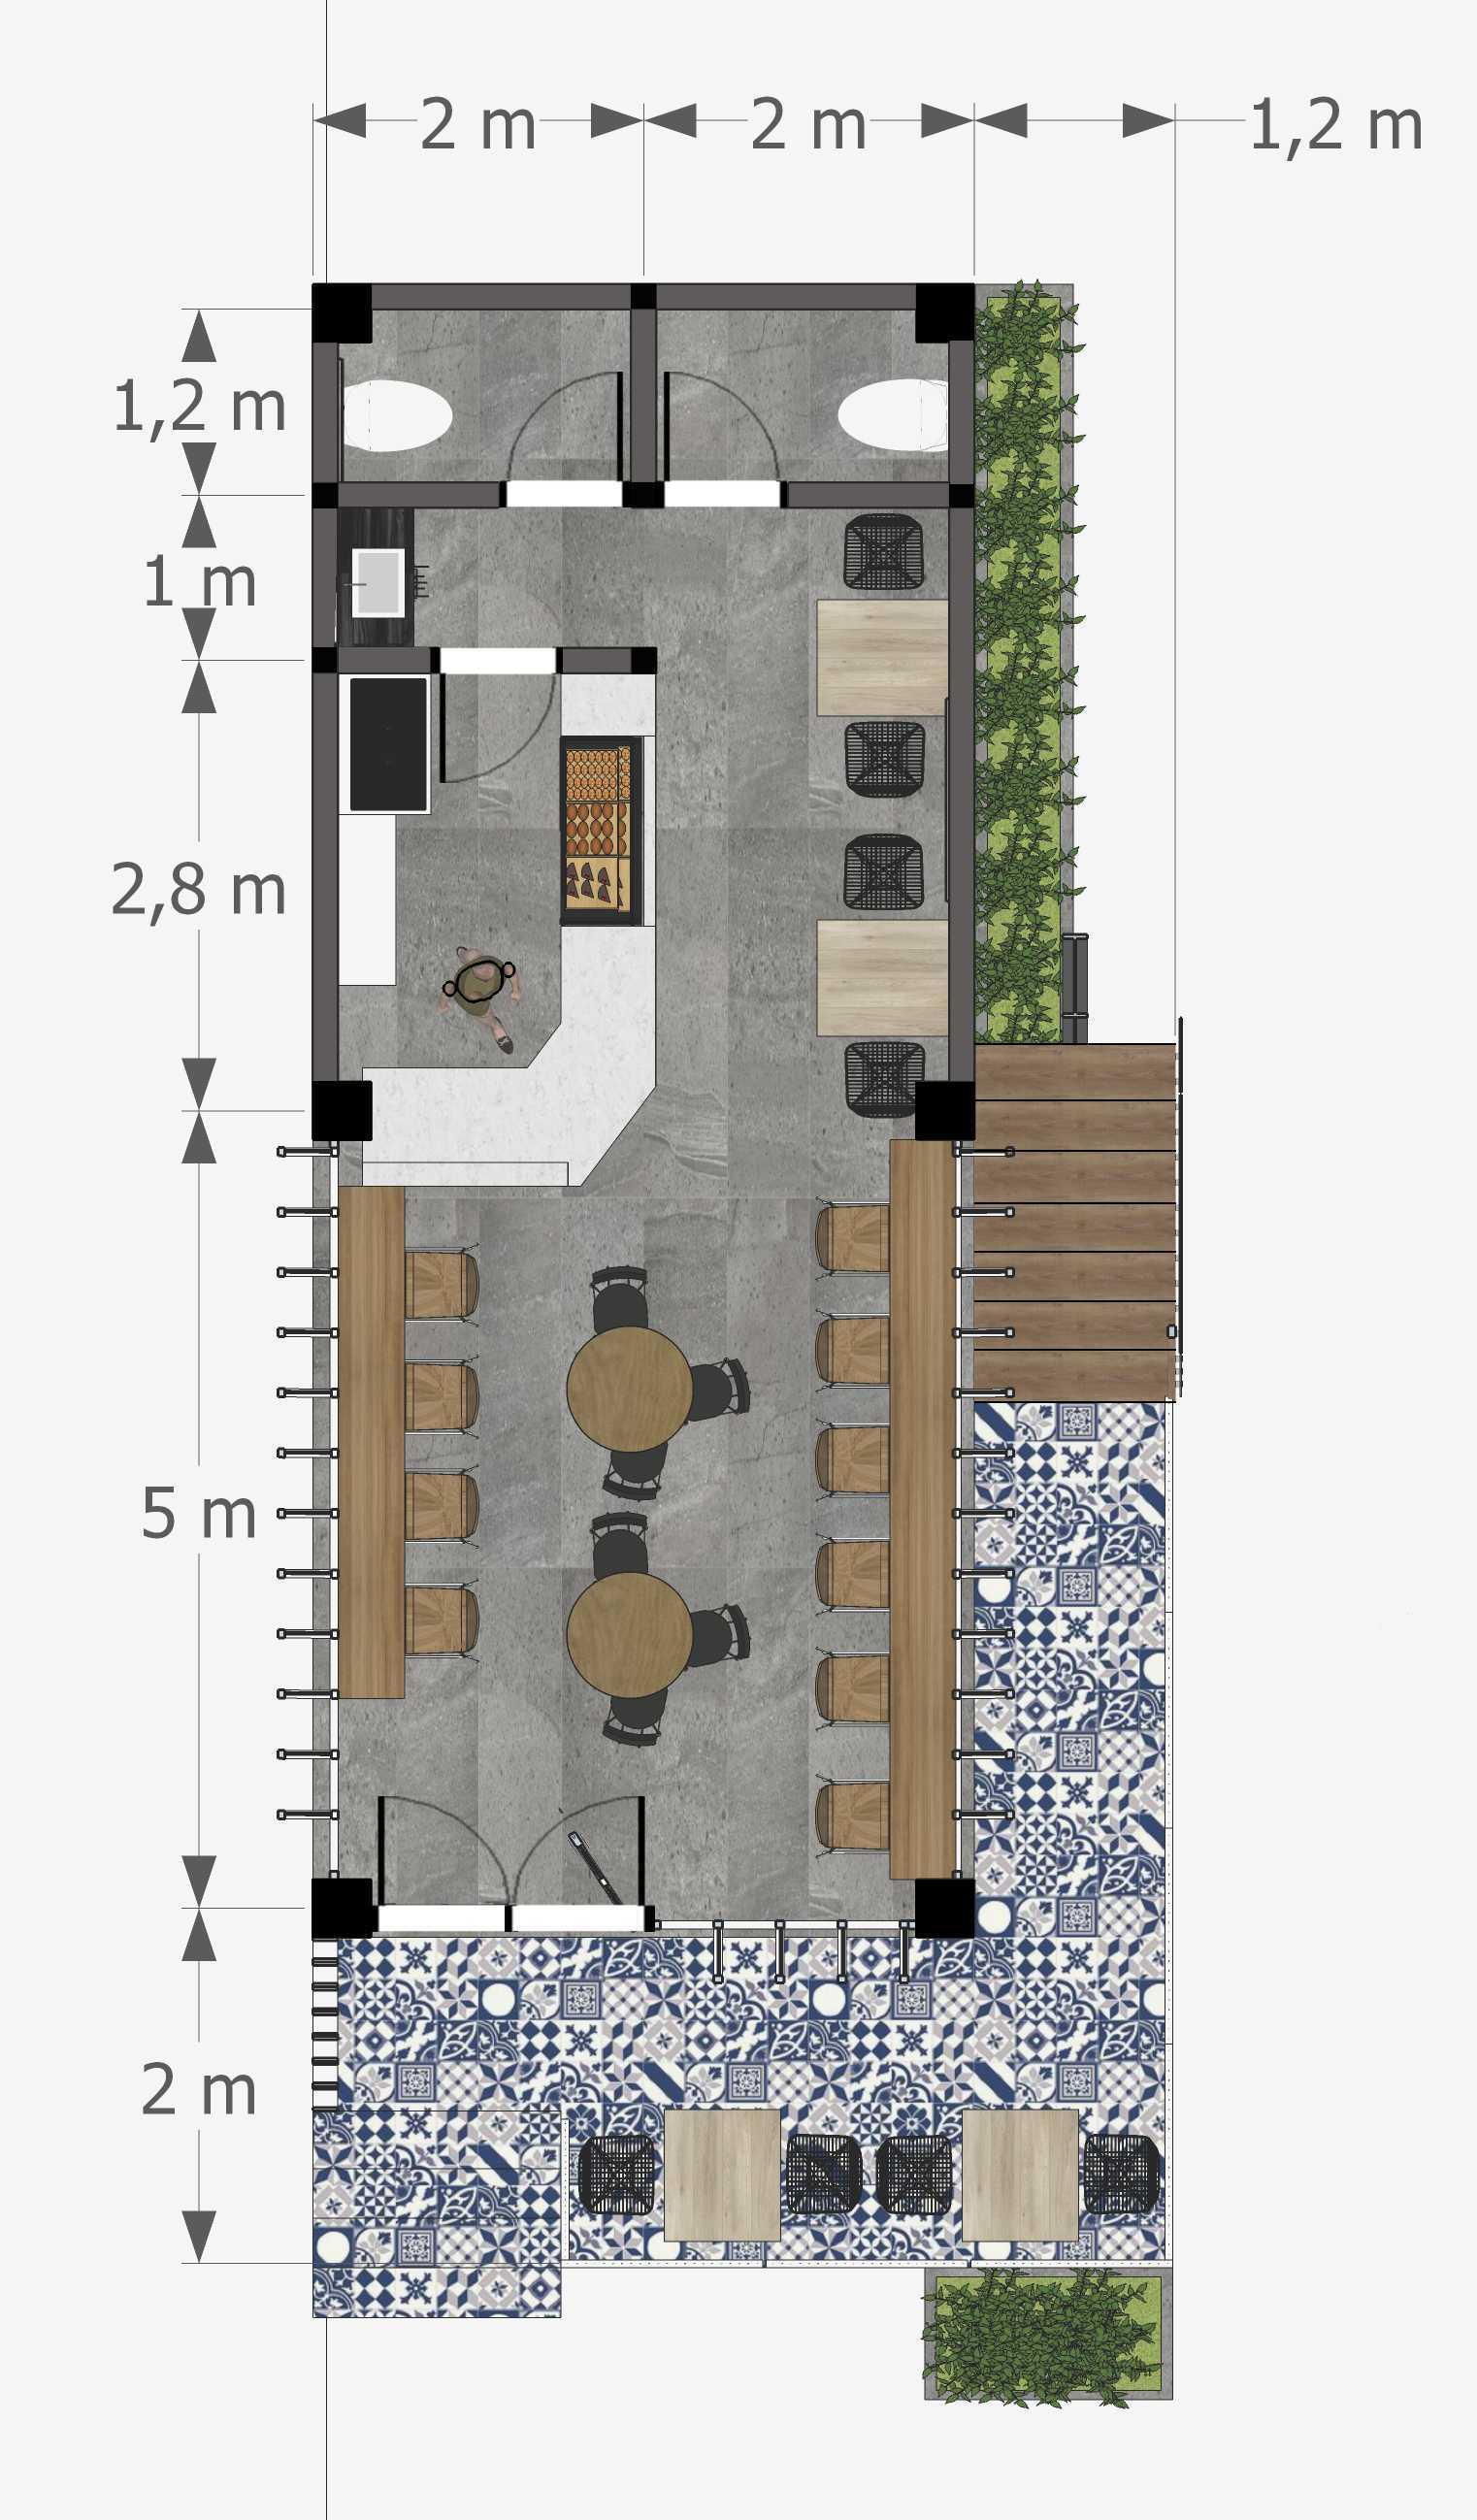 Astabumi Architect & Interior Design Institut Kopi Tegal Tegal, Kota Tegal, Jawa Tengah, Indonesia Tegal, Kota Tegal, Jawa Tengah, Indonesia Astabumi-Architect-Interior-Design-Institut-Kopi-Tegal   83517